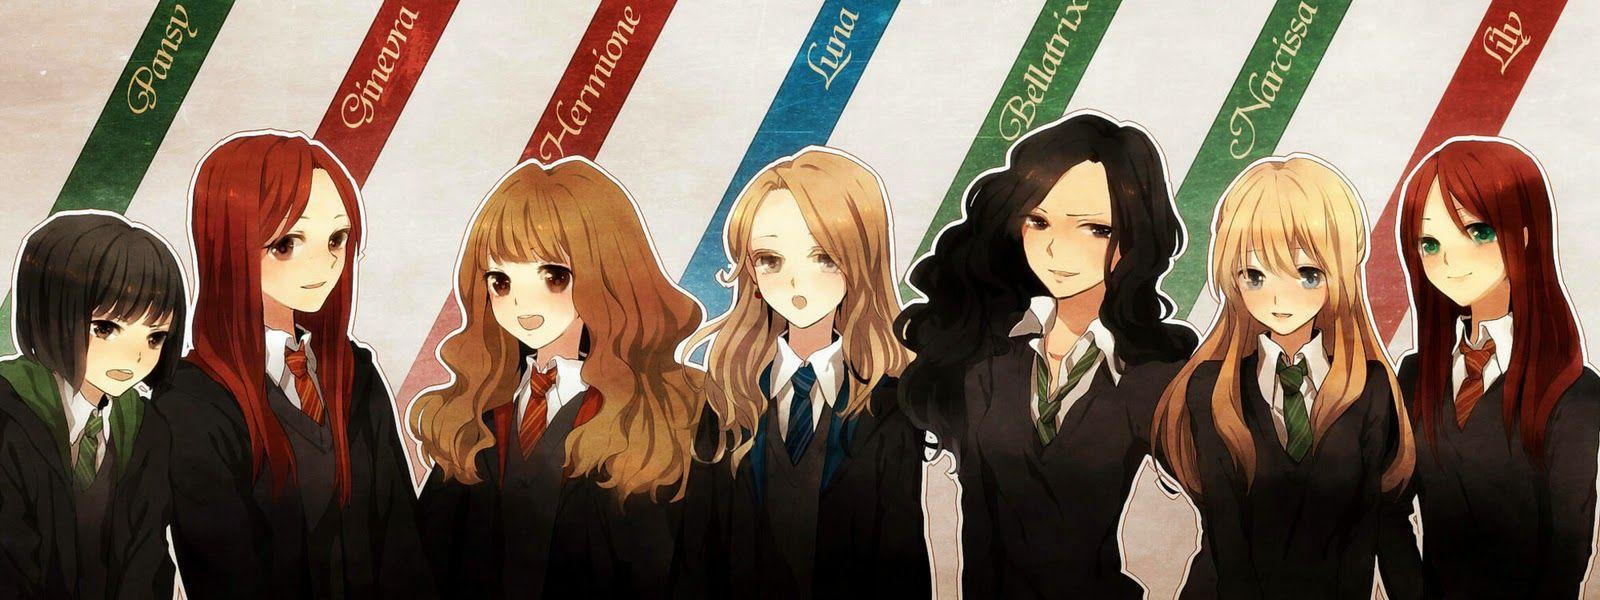 Harry Potter Girls Harry Potter Anime/CartoonStyle